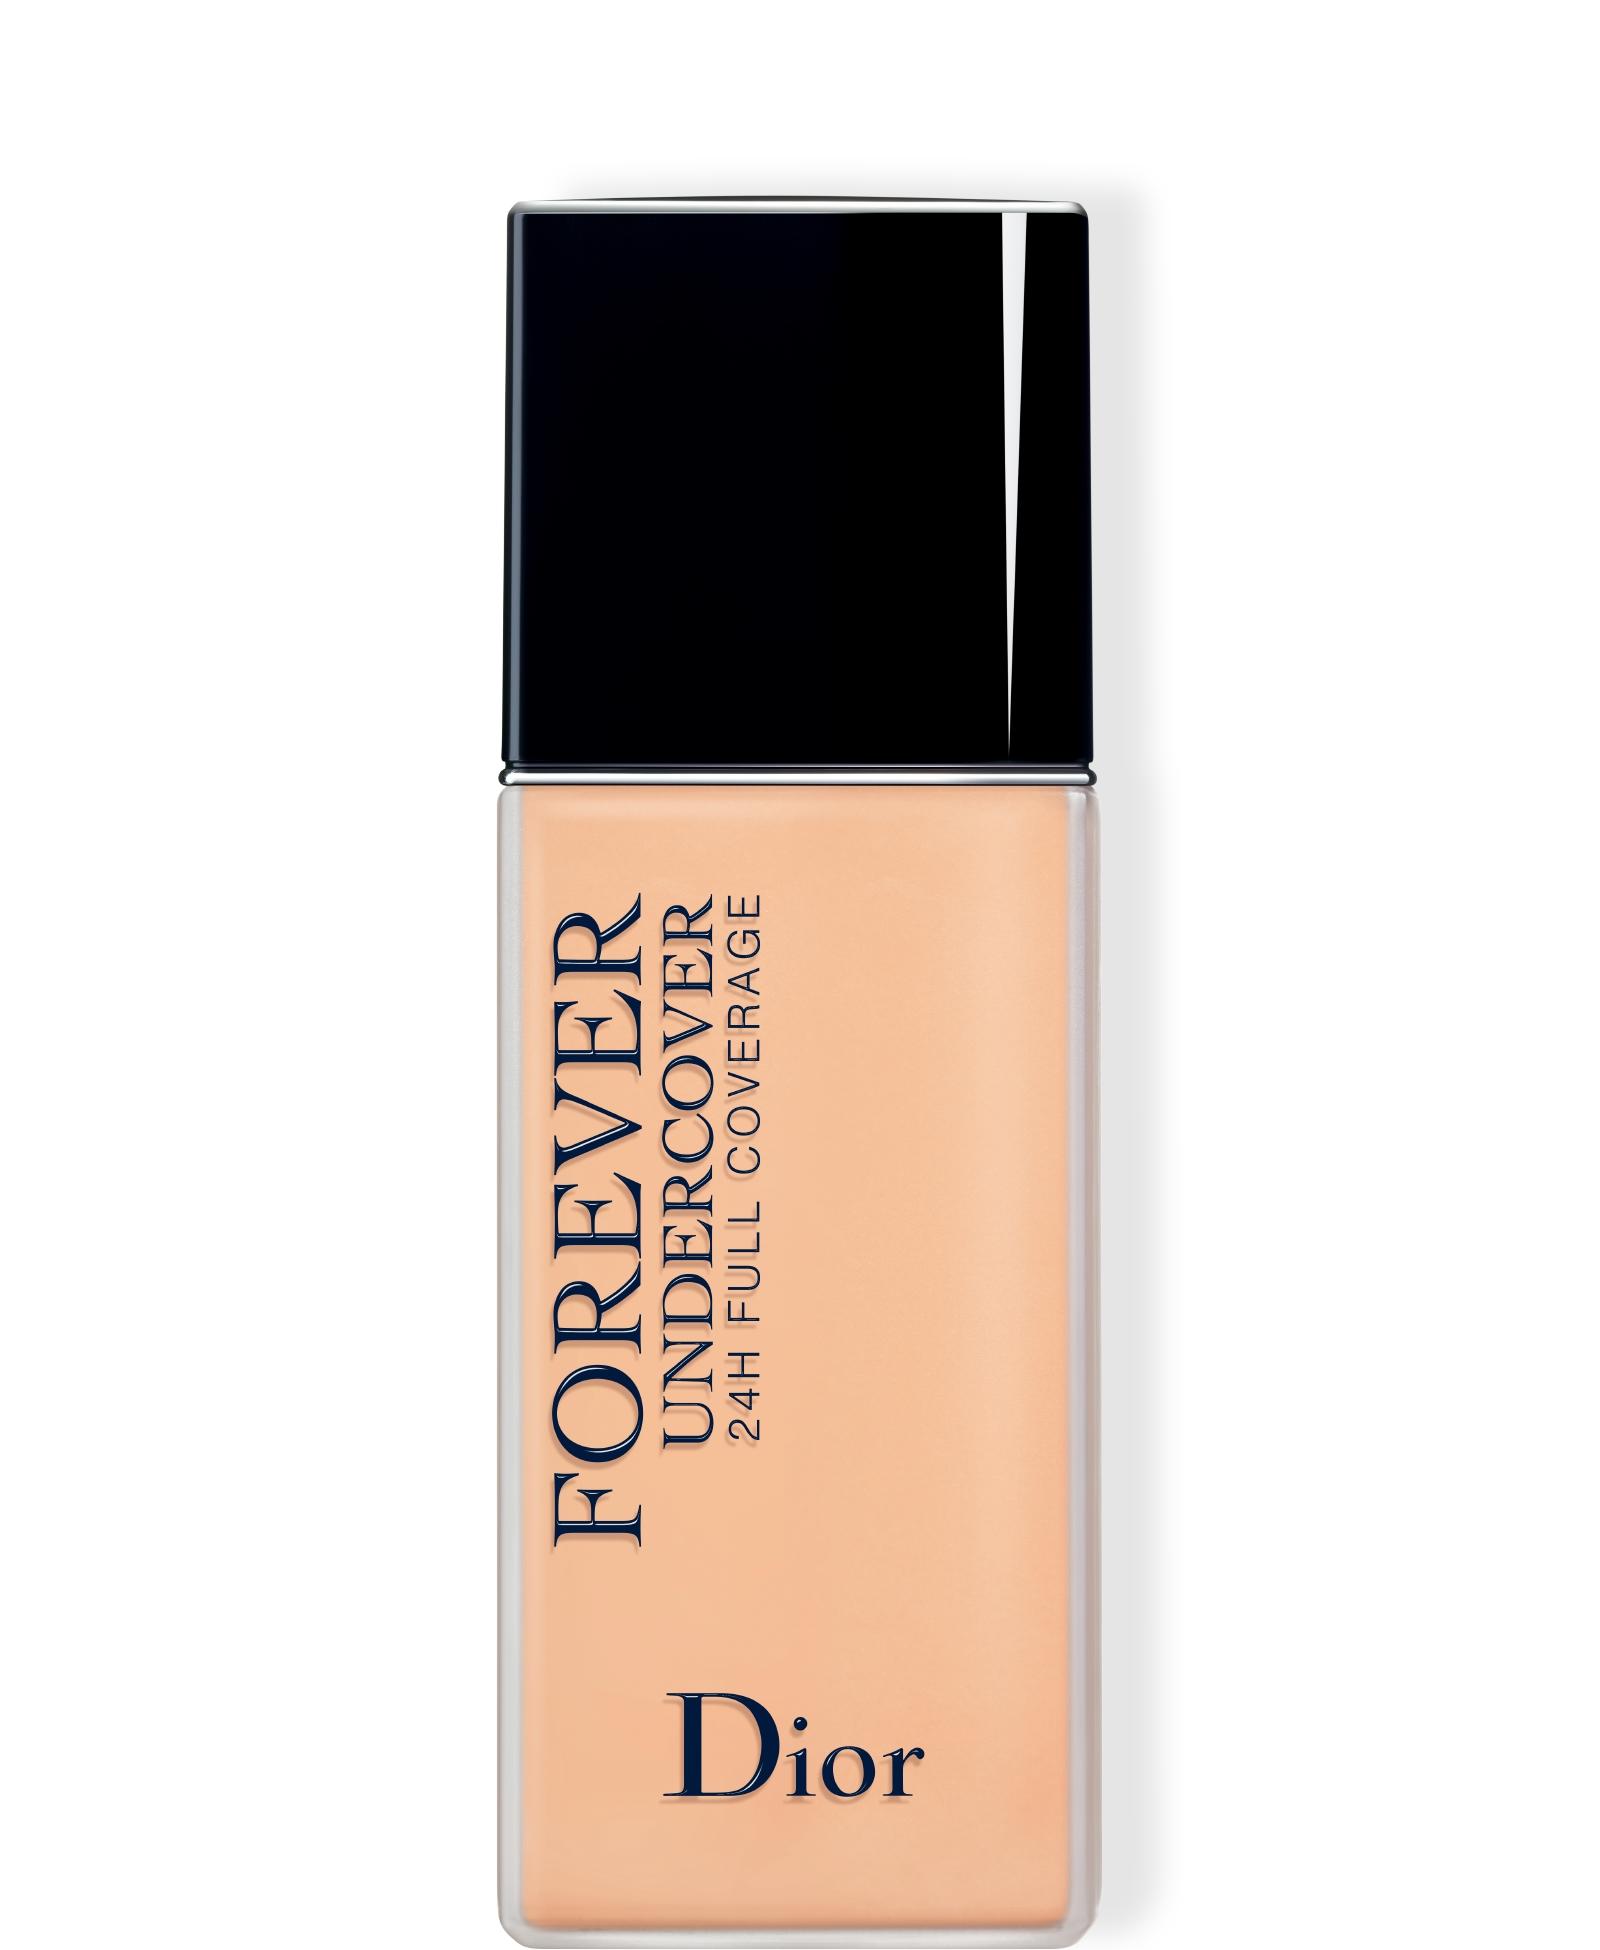 DIOR Diorskin Forever Undercover Foundation, 023 Peach